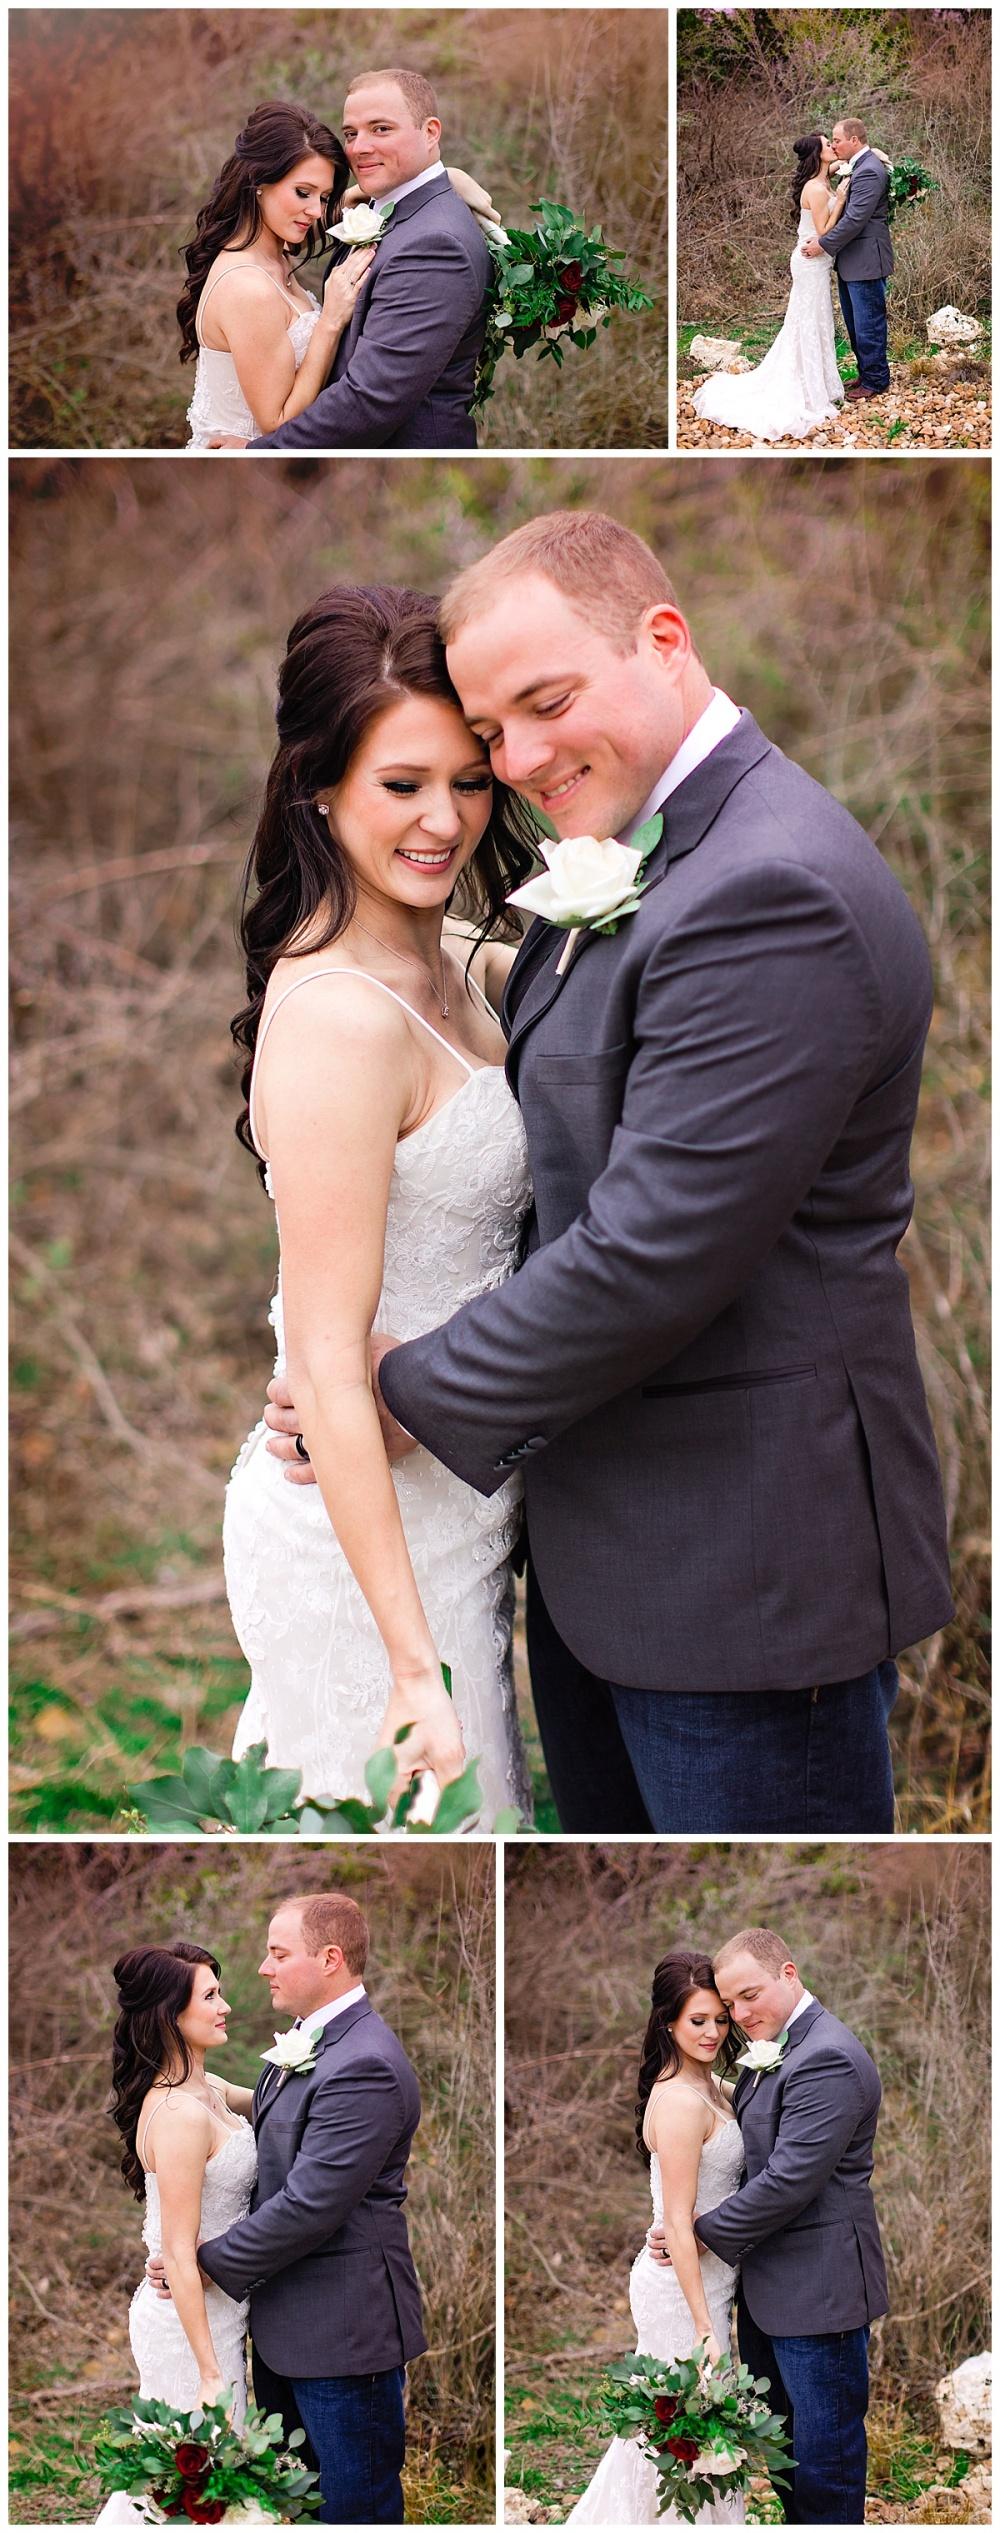 Carly-Barton-Photography-Geronimo-Oaks-Wedding-Venue-Texas-Hill-Country-Ronnie-Sarah_0068.jpg